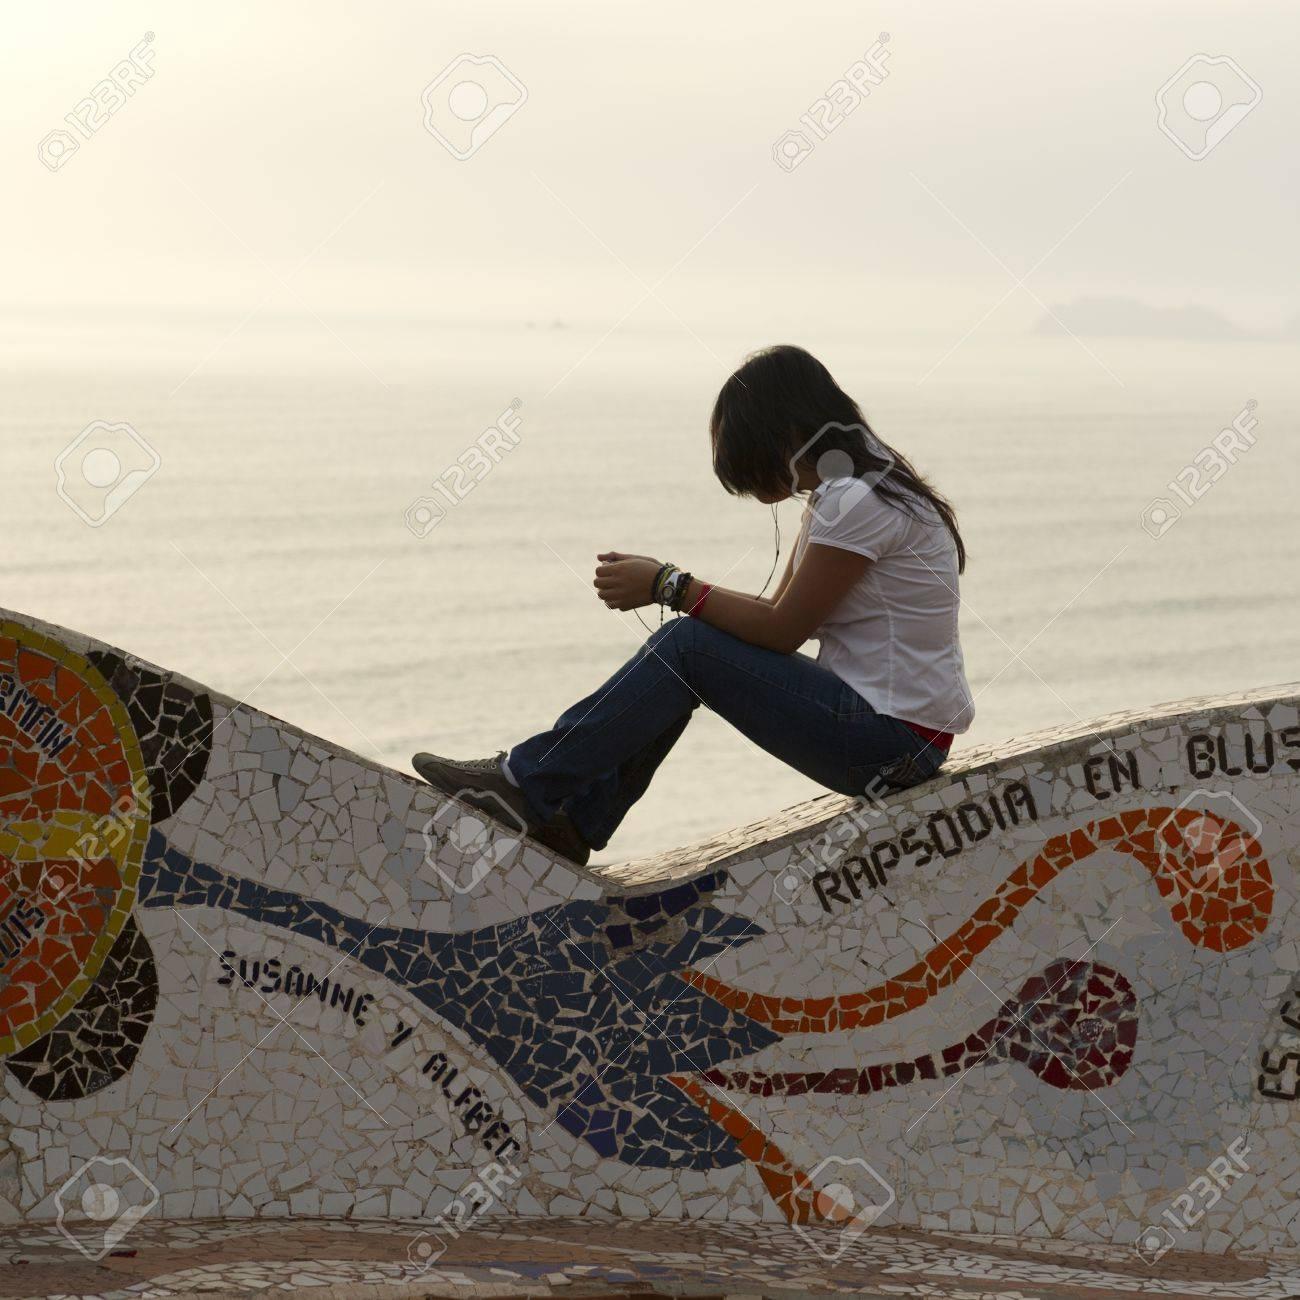 Woman listening to MP3 player in a park, El Parque Del Amor, Av De La Aviacion, Miraflores District, Lima Province, Peru Stock Photo - 16783717